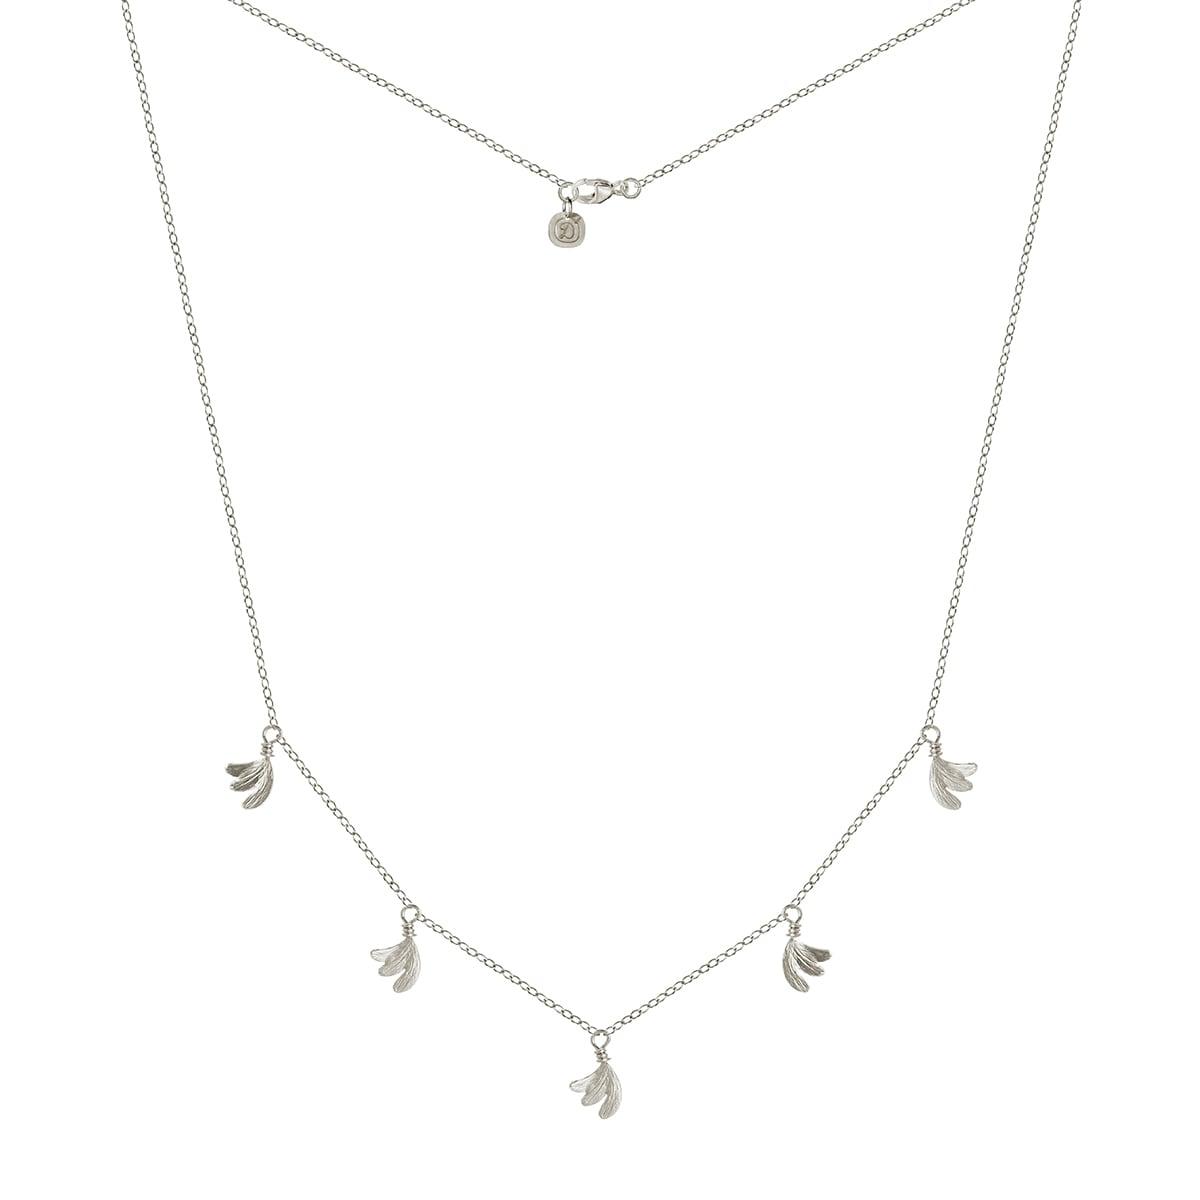 Dulong, Fine Jewelry_Aura_Silverhasband_AUR5-F1010_hos_Jarl_Sandin